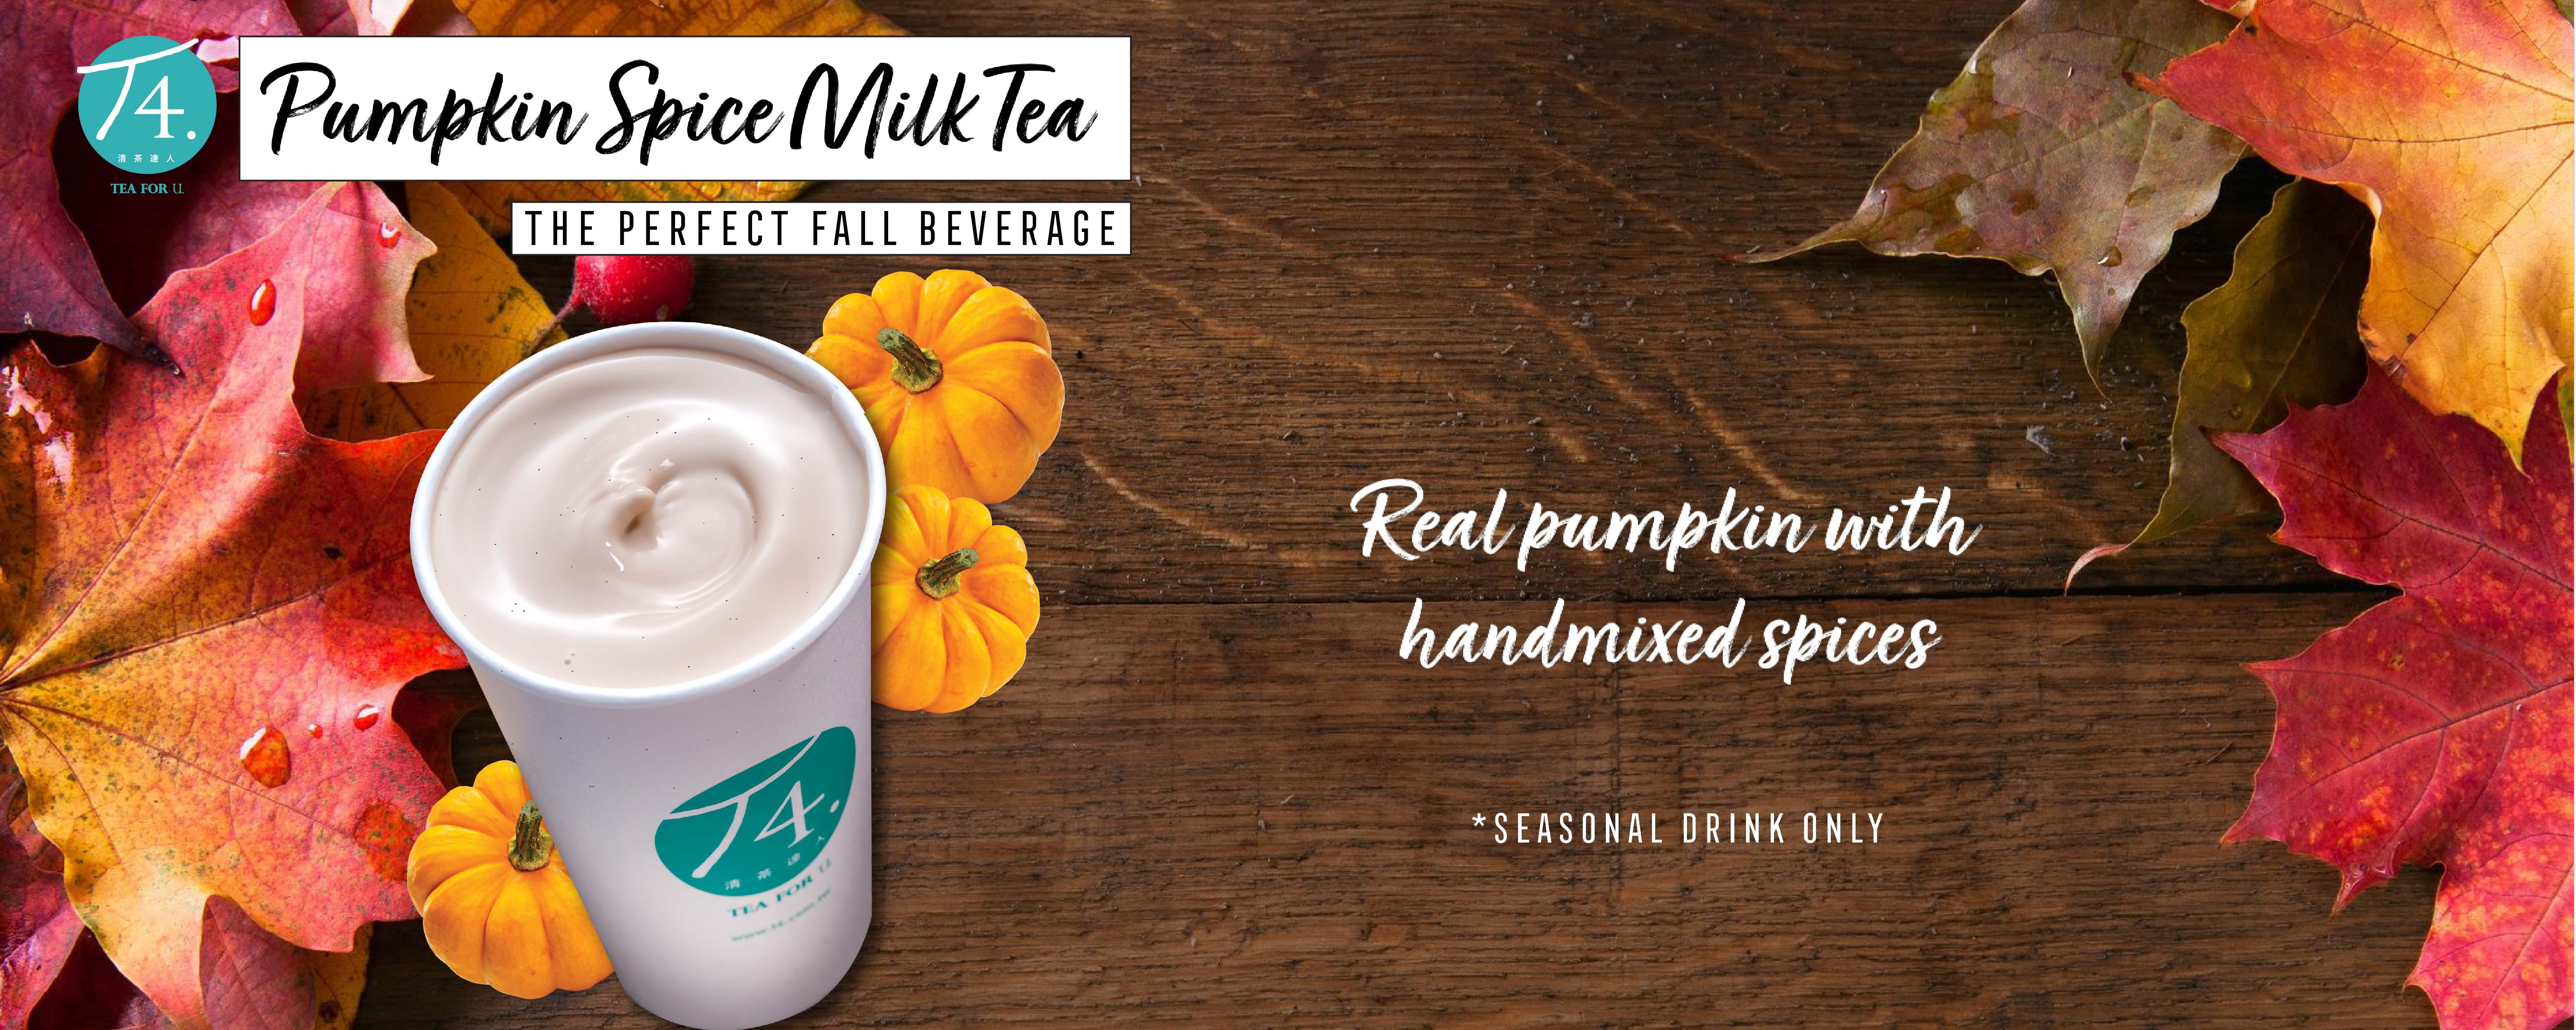 Seasonal Pumpkin Spice Milk Tea $4.25